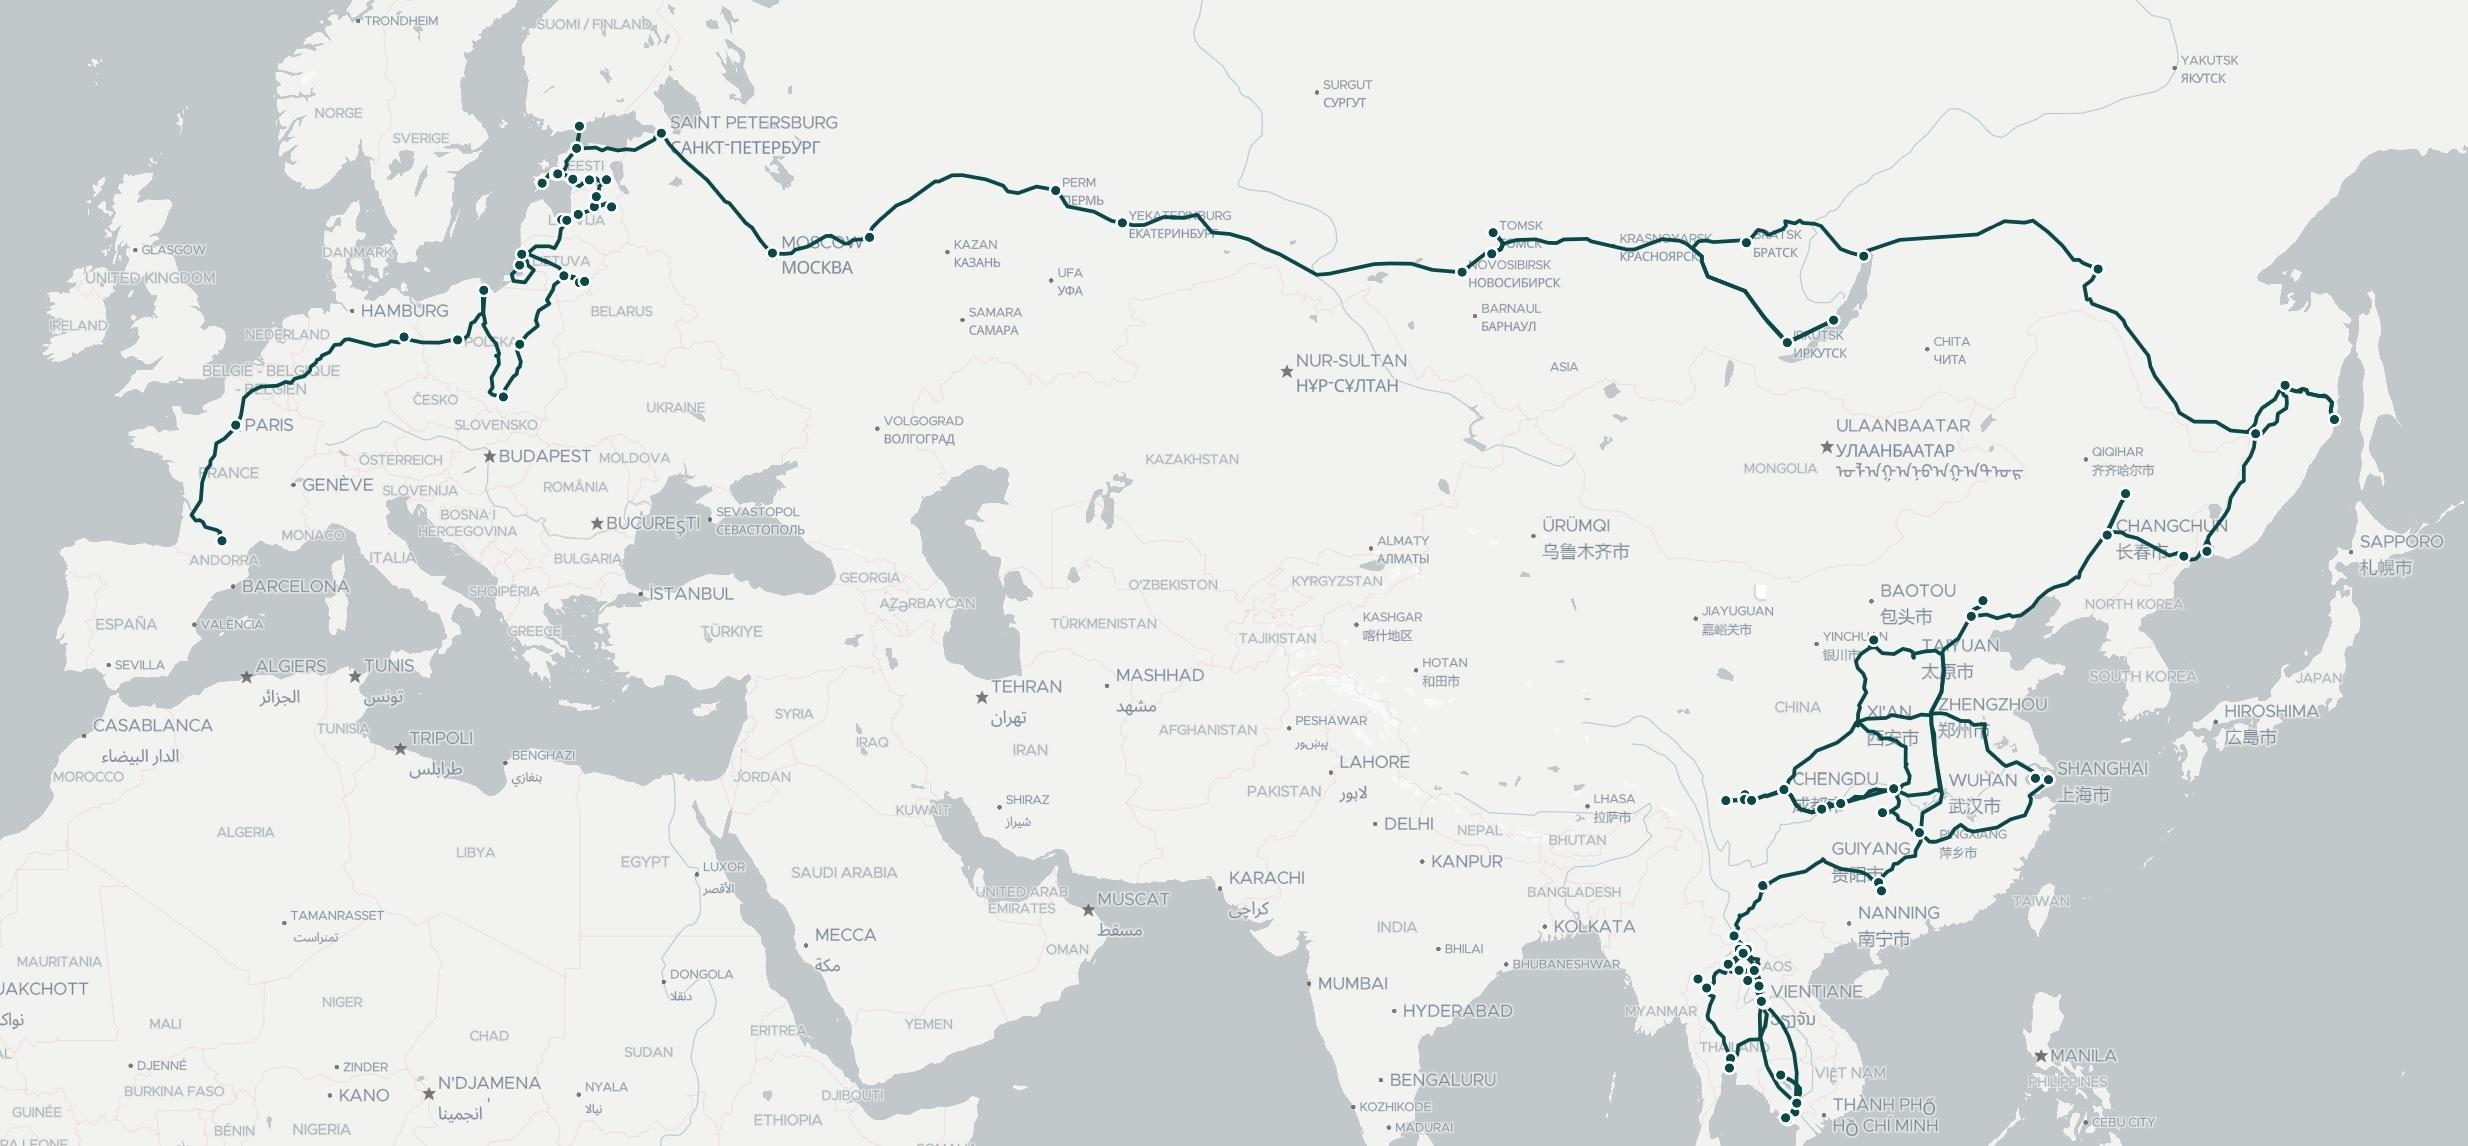 Aventures terrestres et maritimes en Eurasie, la carte